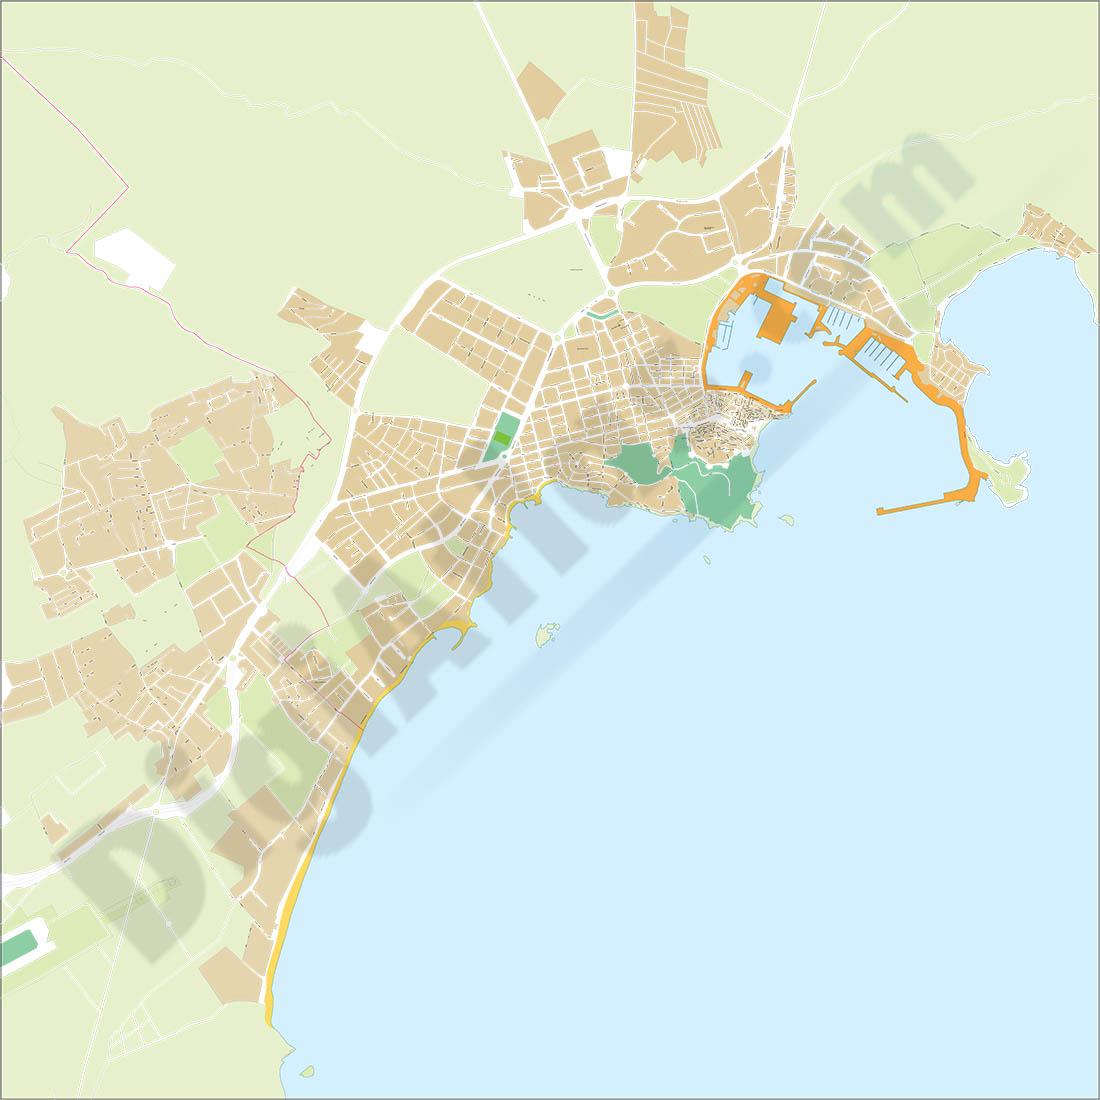 Eivissa-Ibiza - plano callejero